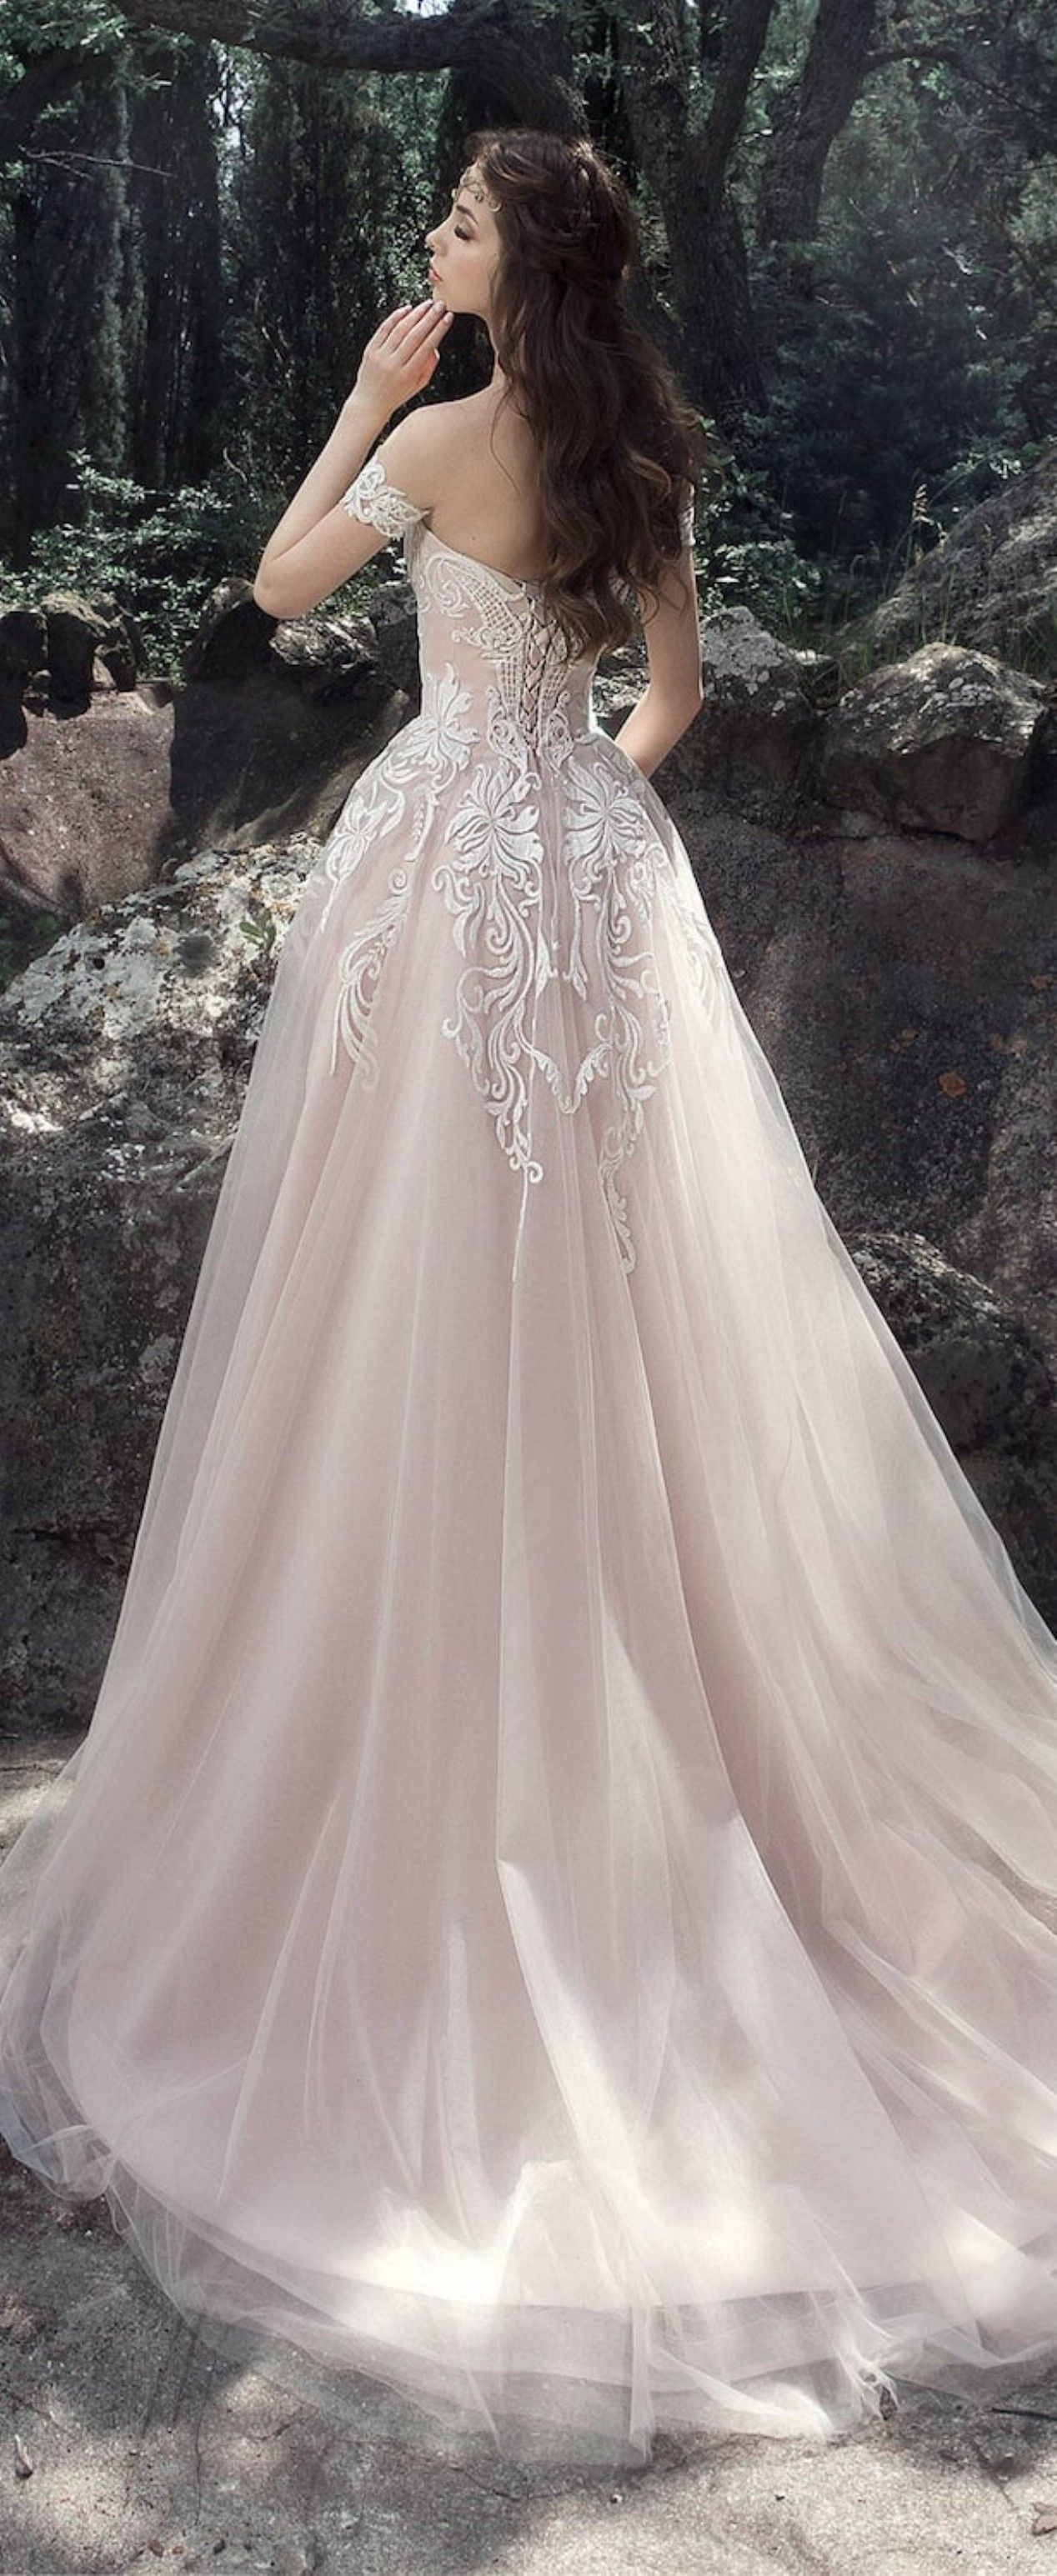 Lovely  Breathtaking Disney Princess Wedding Dress to Fullfill your Wedding Fantasy